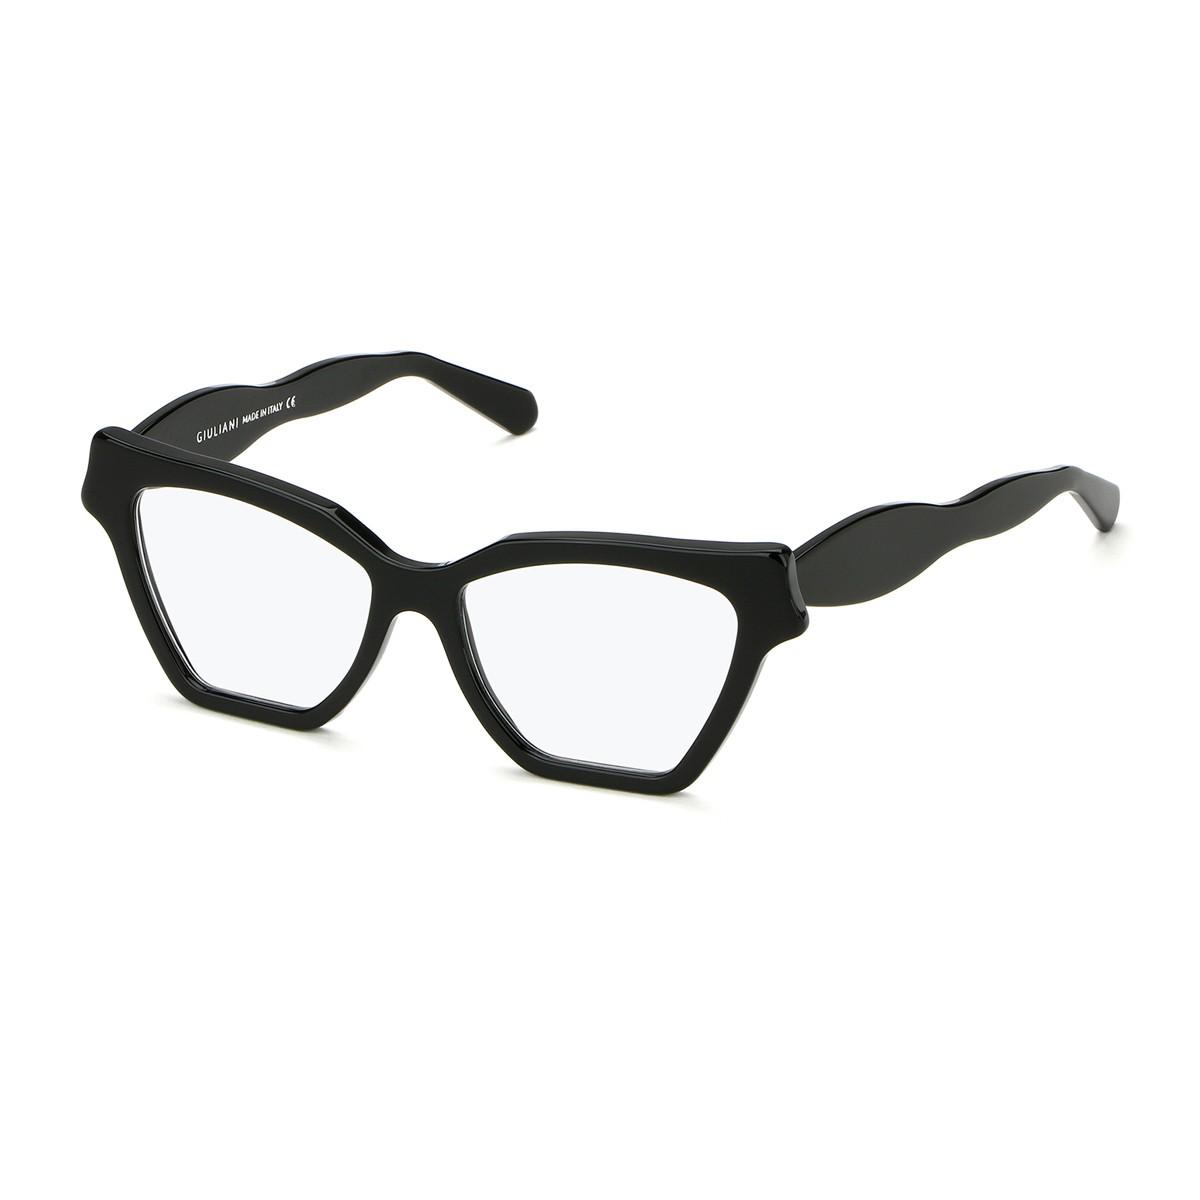 Giuliani H168 | Women's eyeglasses